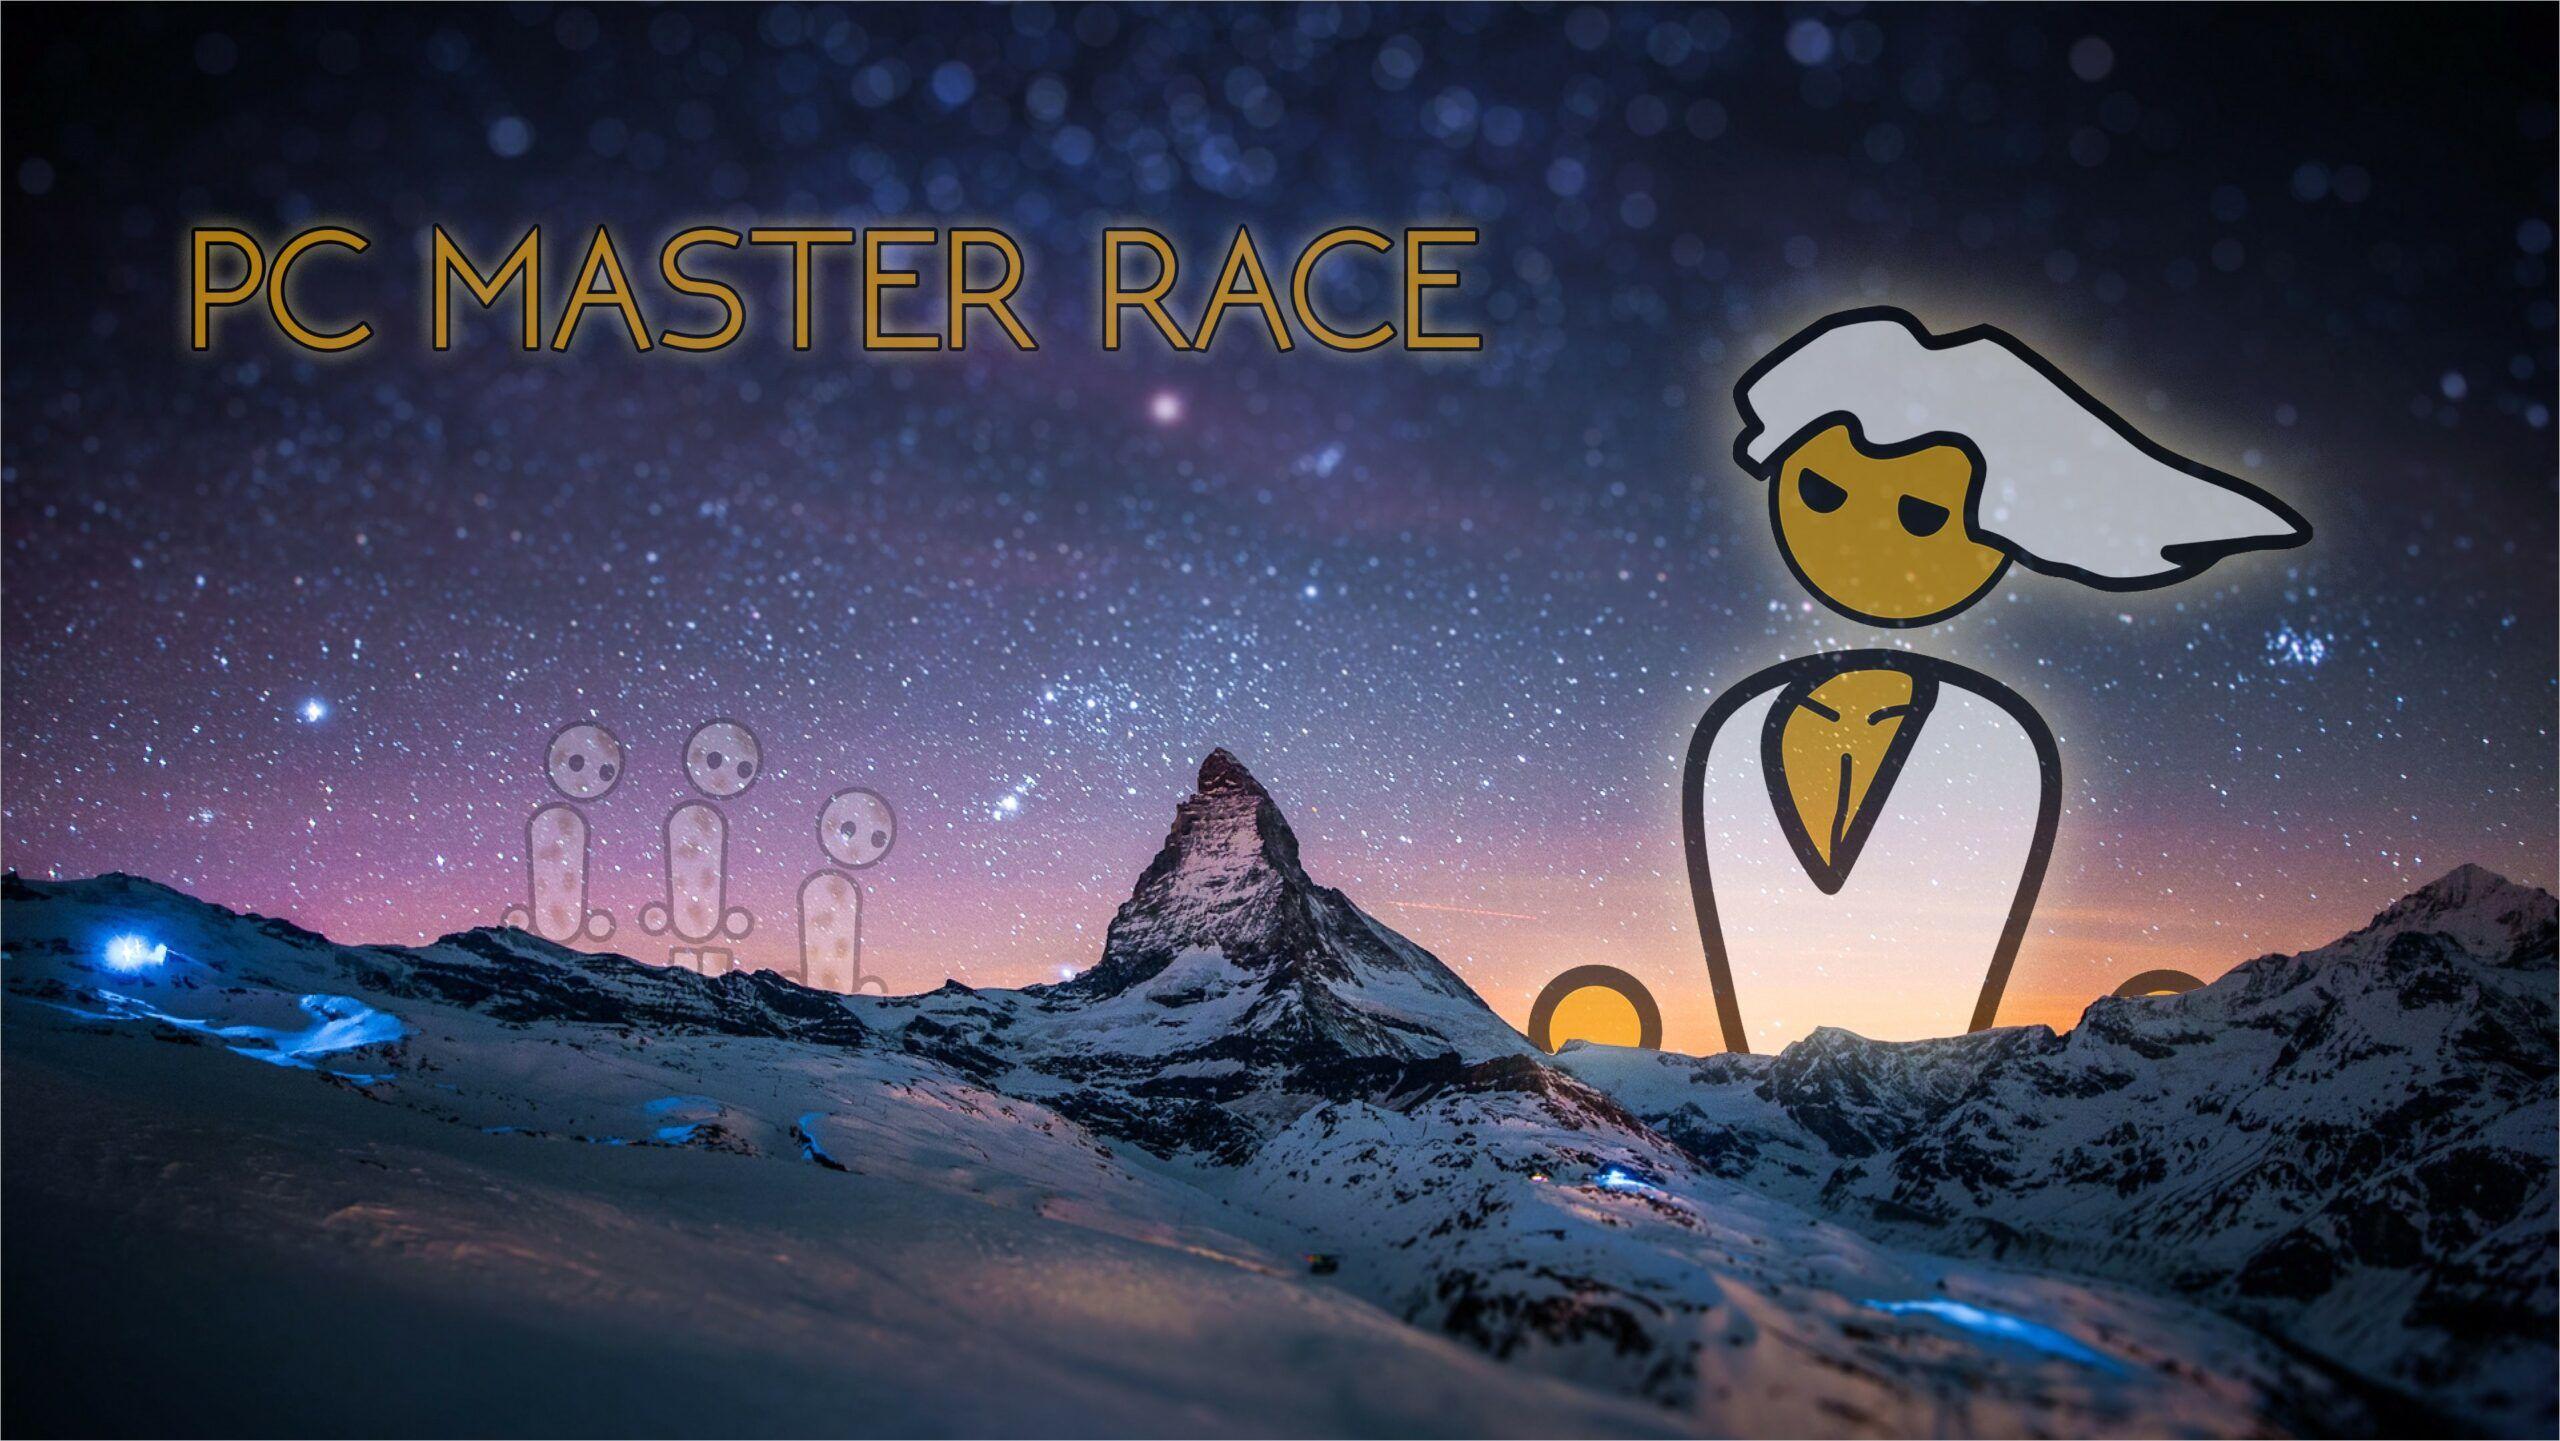 4k Pc Master Race Wallpaper In 2020 Wallpaper Pc Gaming Wallpapers